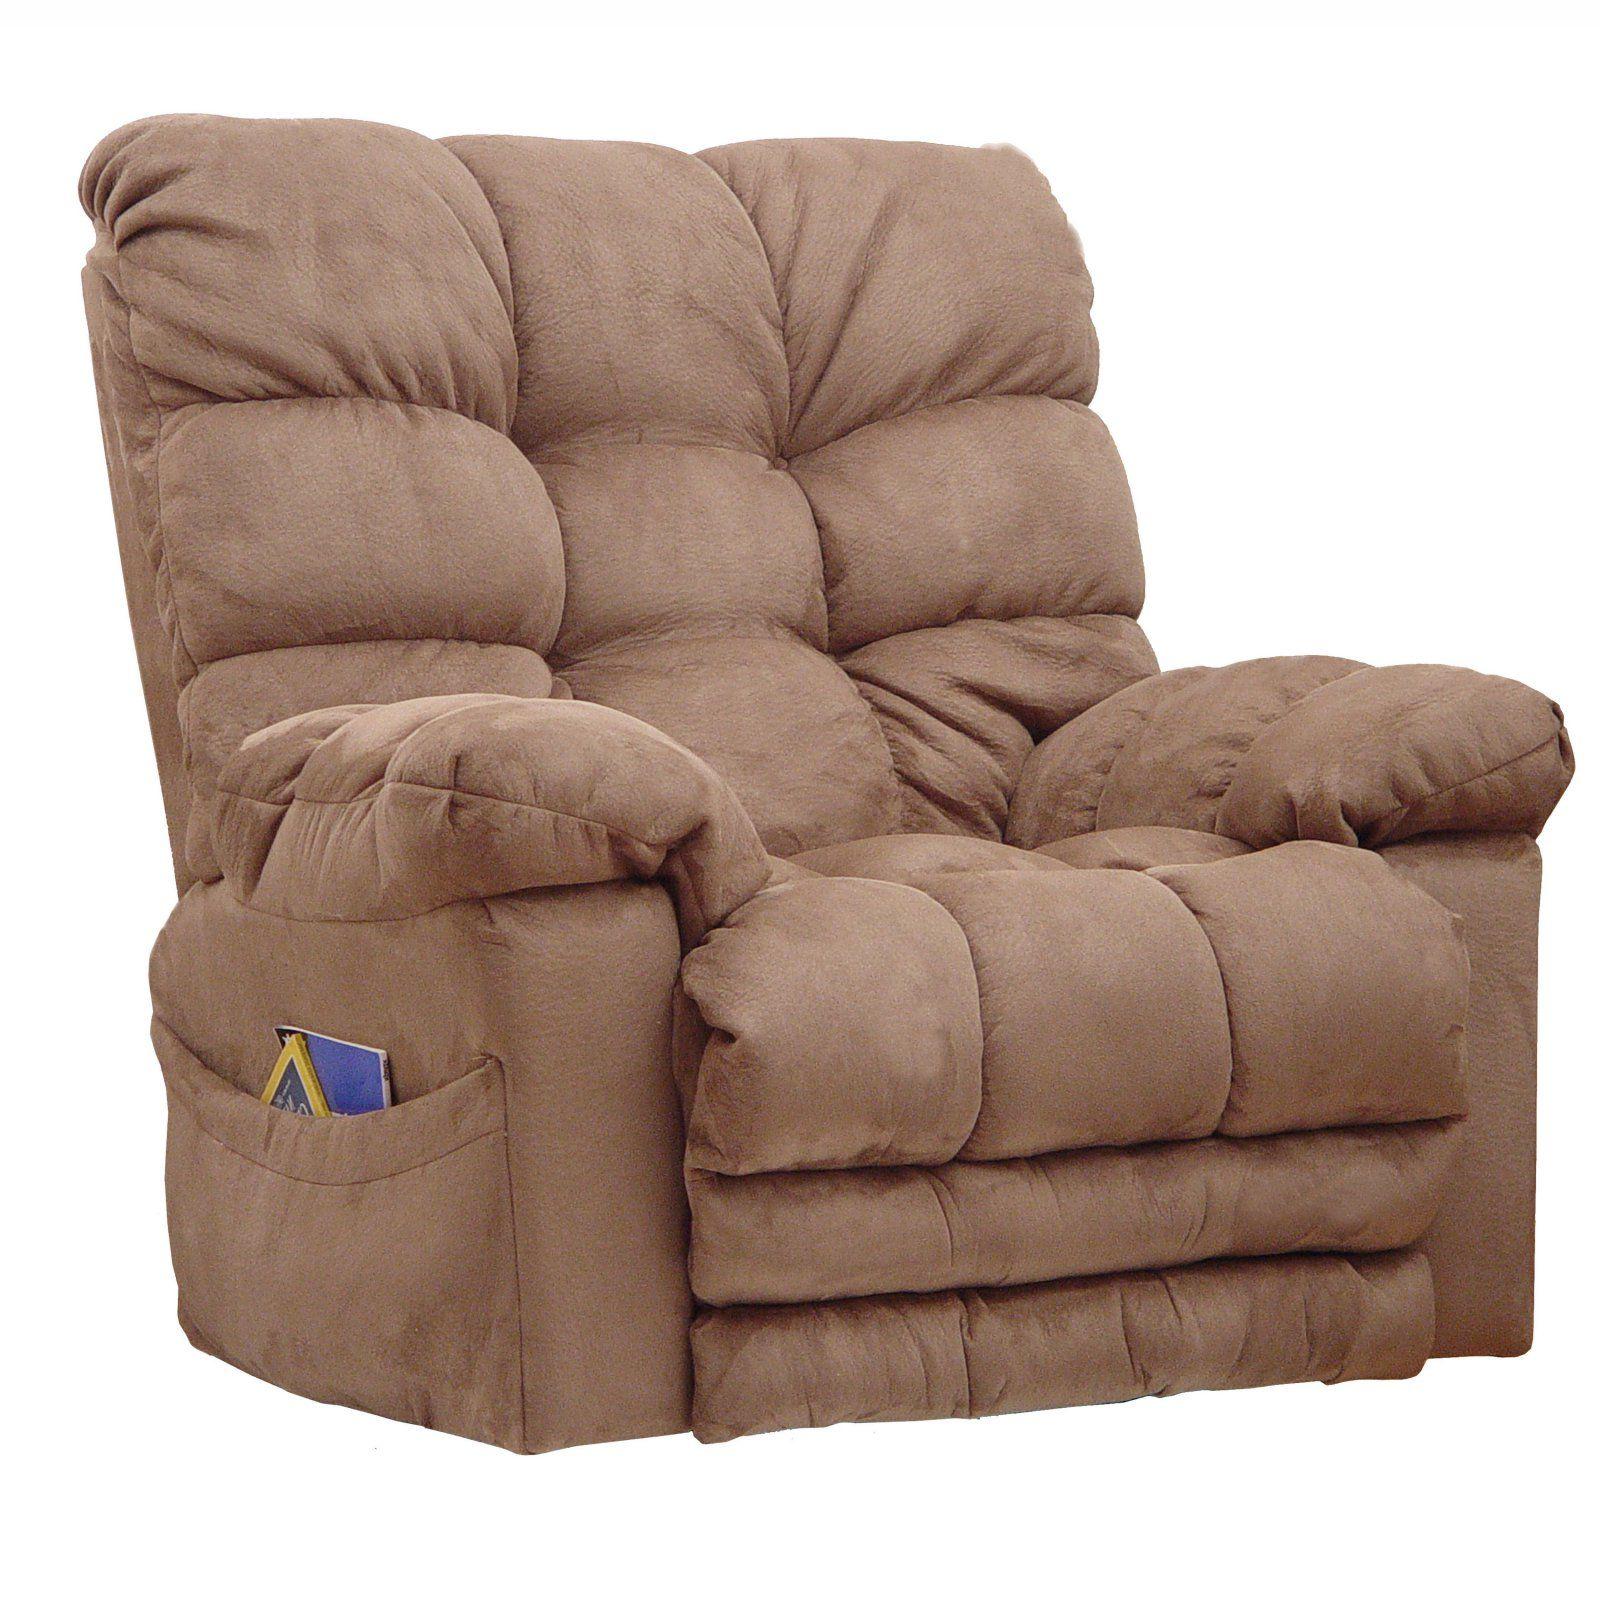 Astonishing Catnapper Deluxe Magnum Heat Massage Rocker Recliner Creativecarmelina Interior Chair Design Creativecarmelinacom